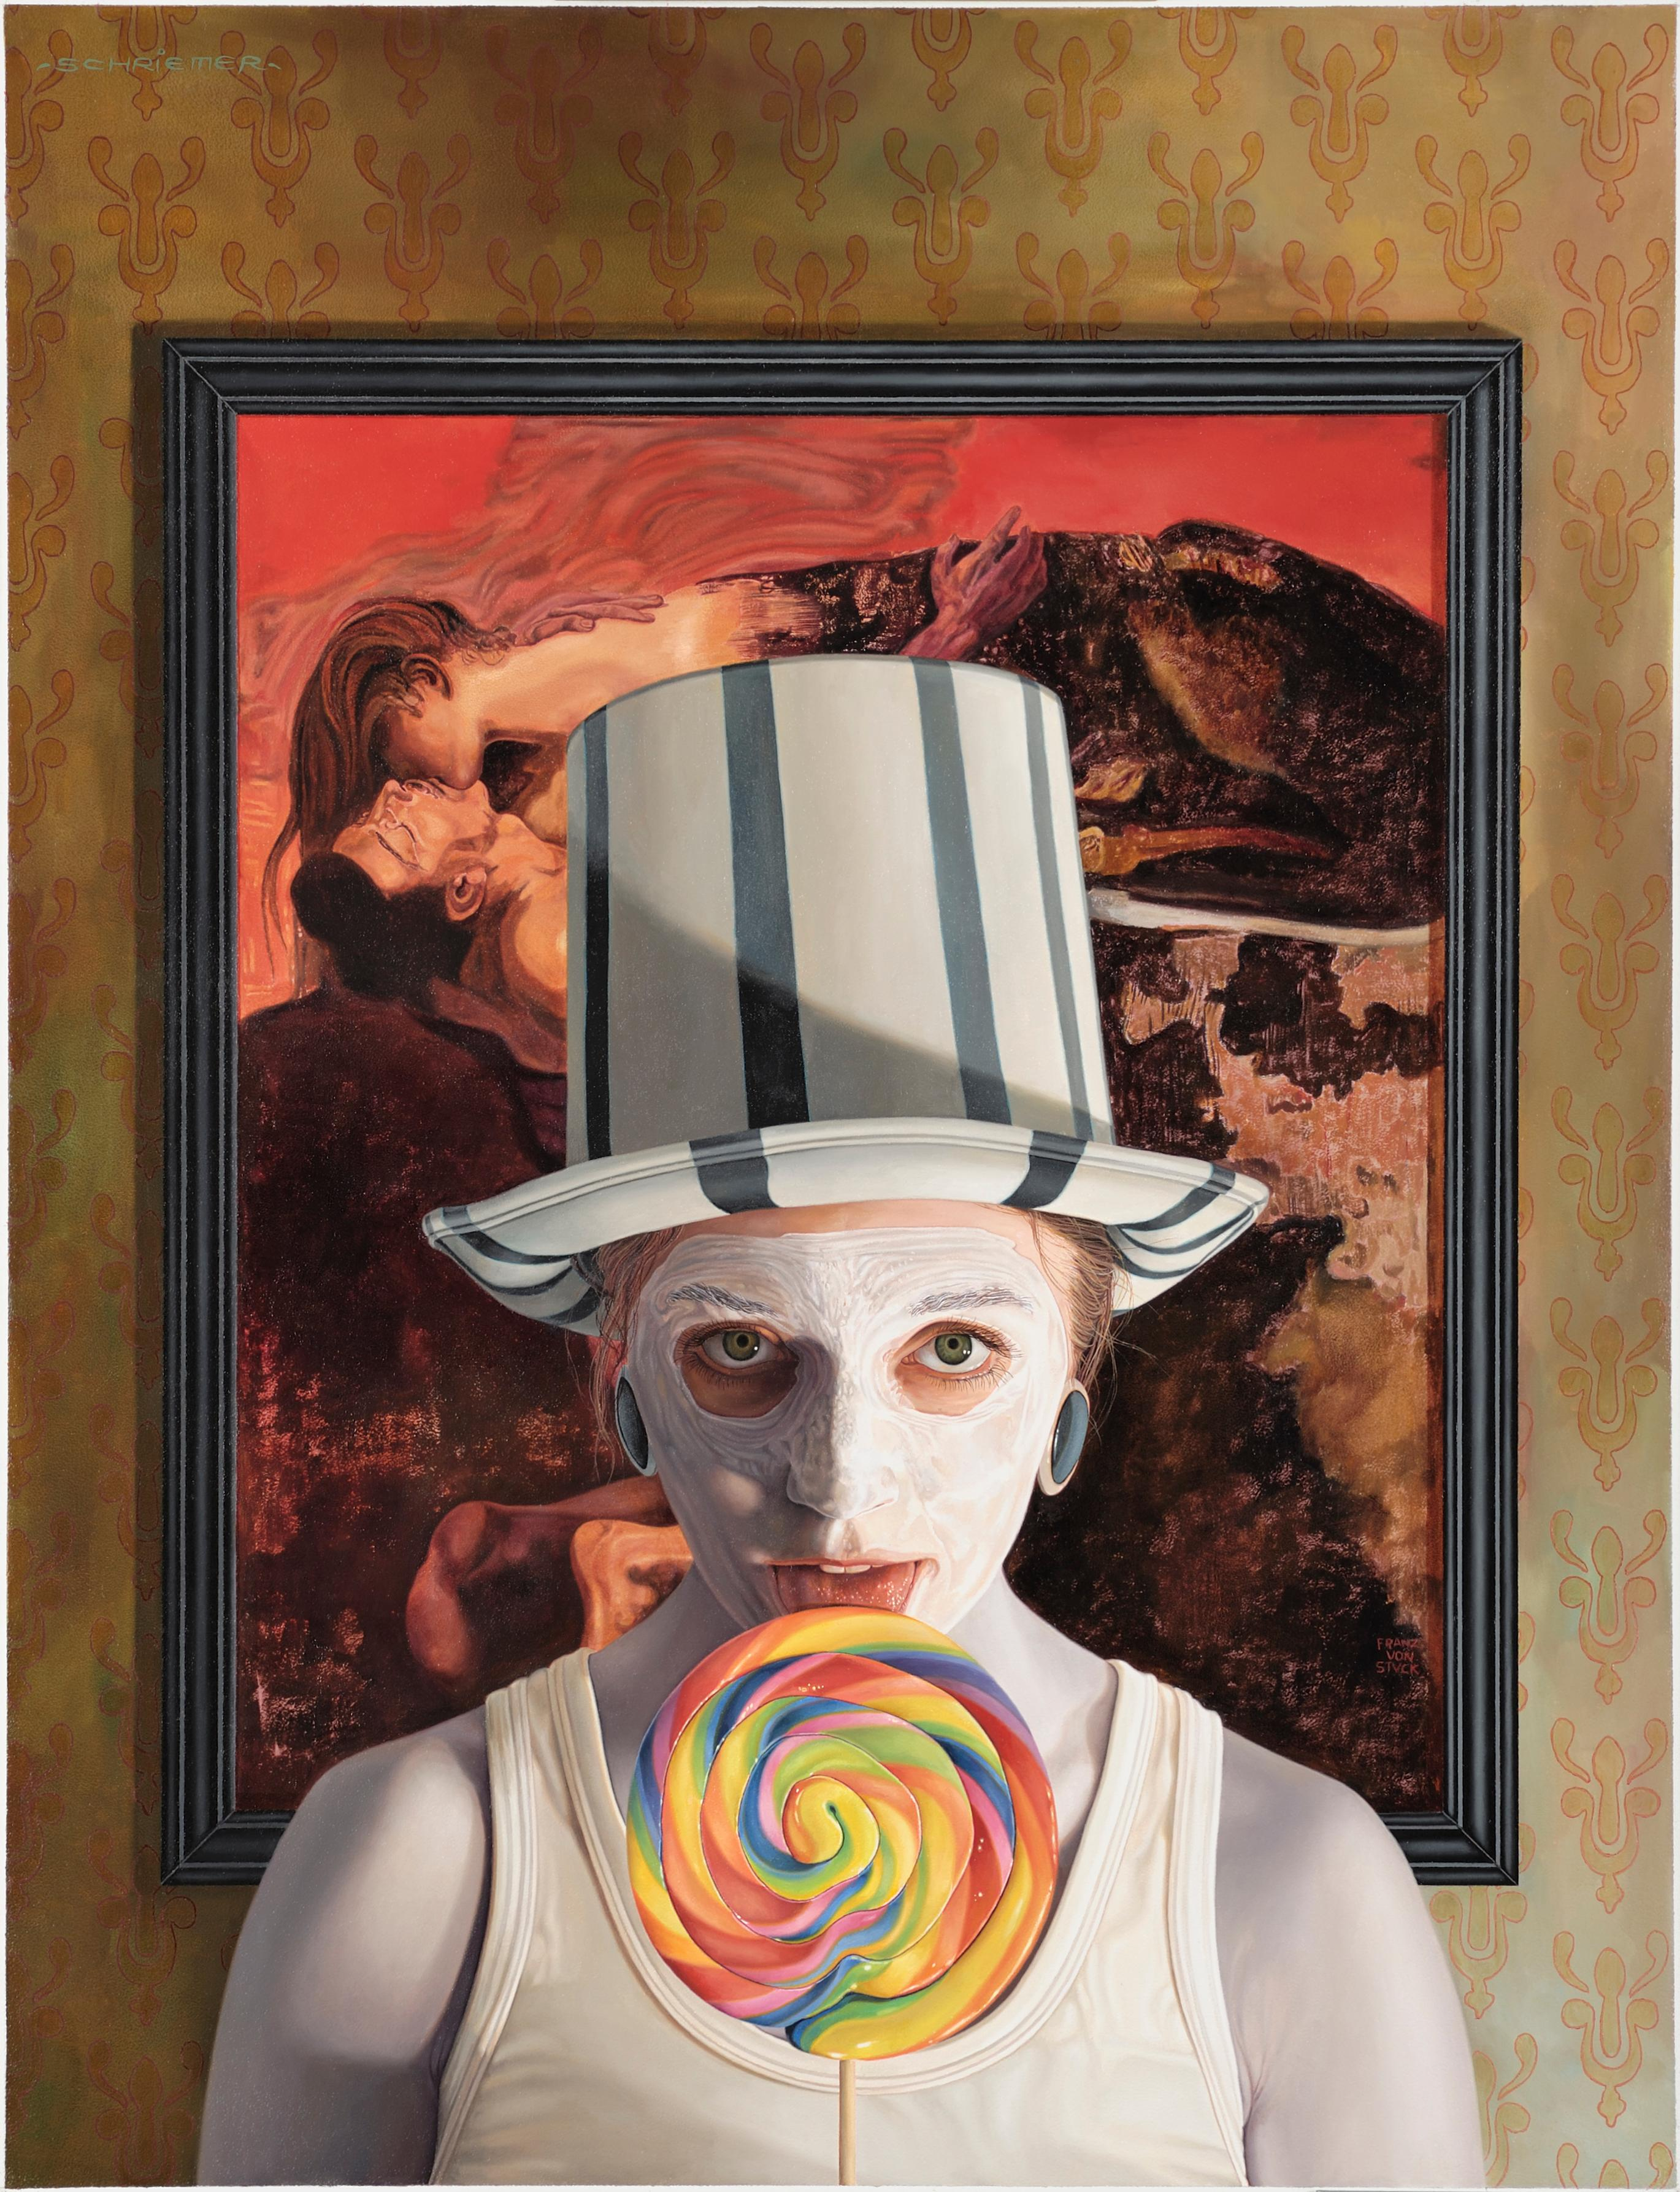 Stuck -  21st Century contemporary narrative portrait painting